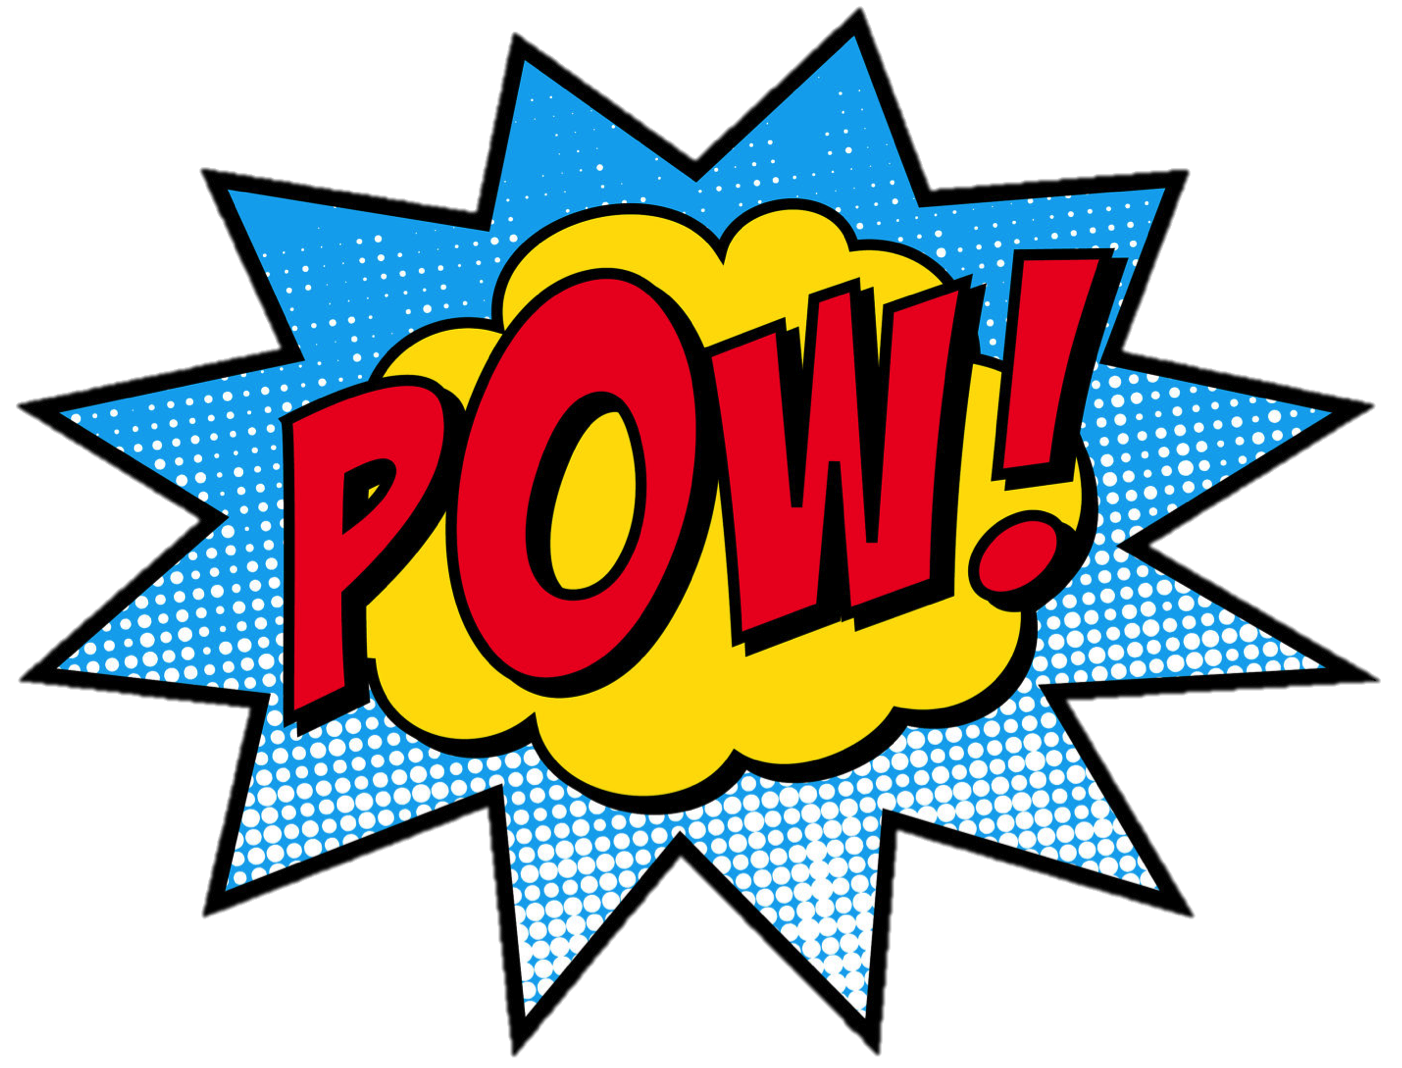 Super hero clipart background image black and white Free Superhero Background Cliparts, Download Free Clip Art ... image black and white